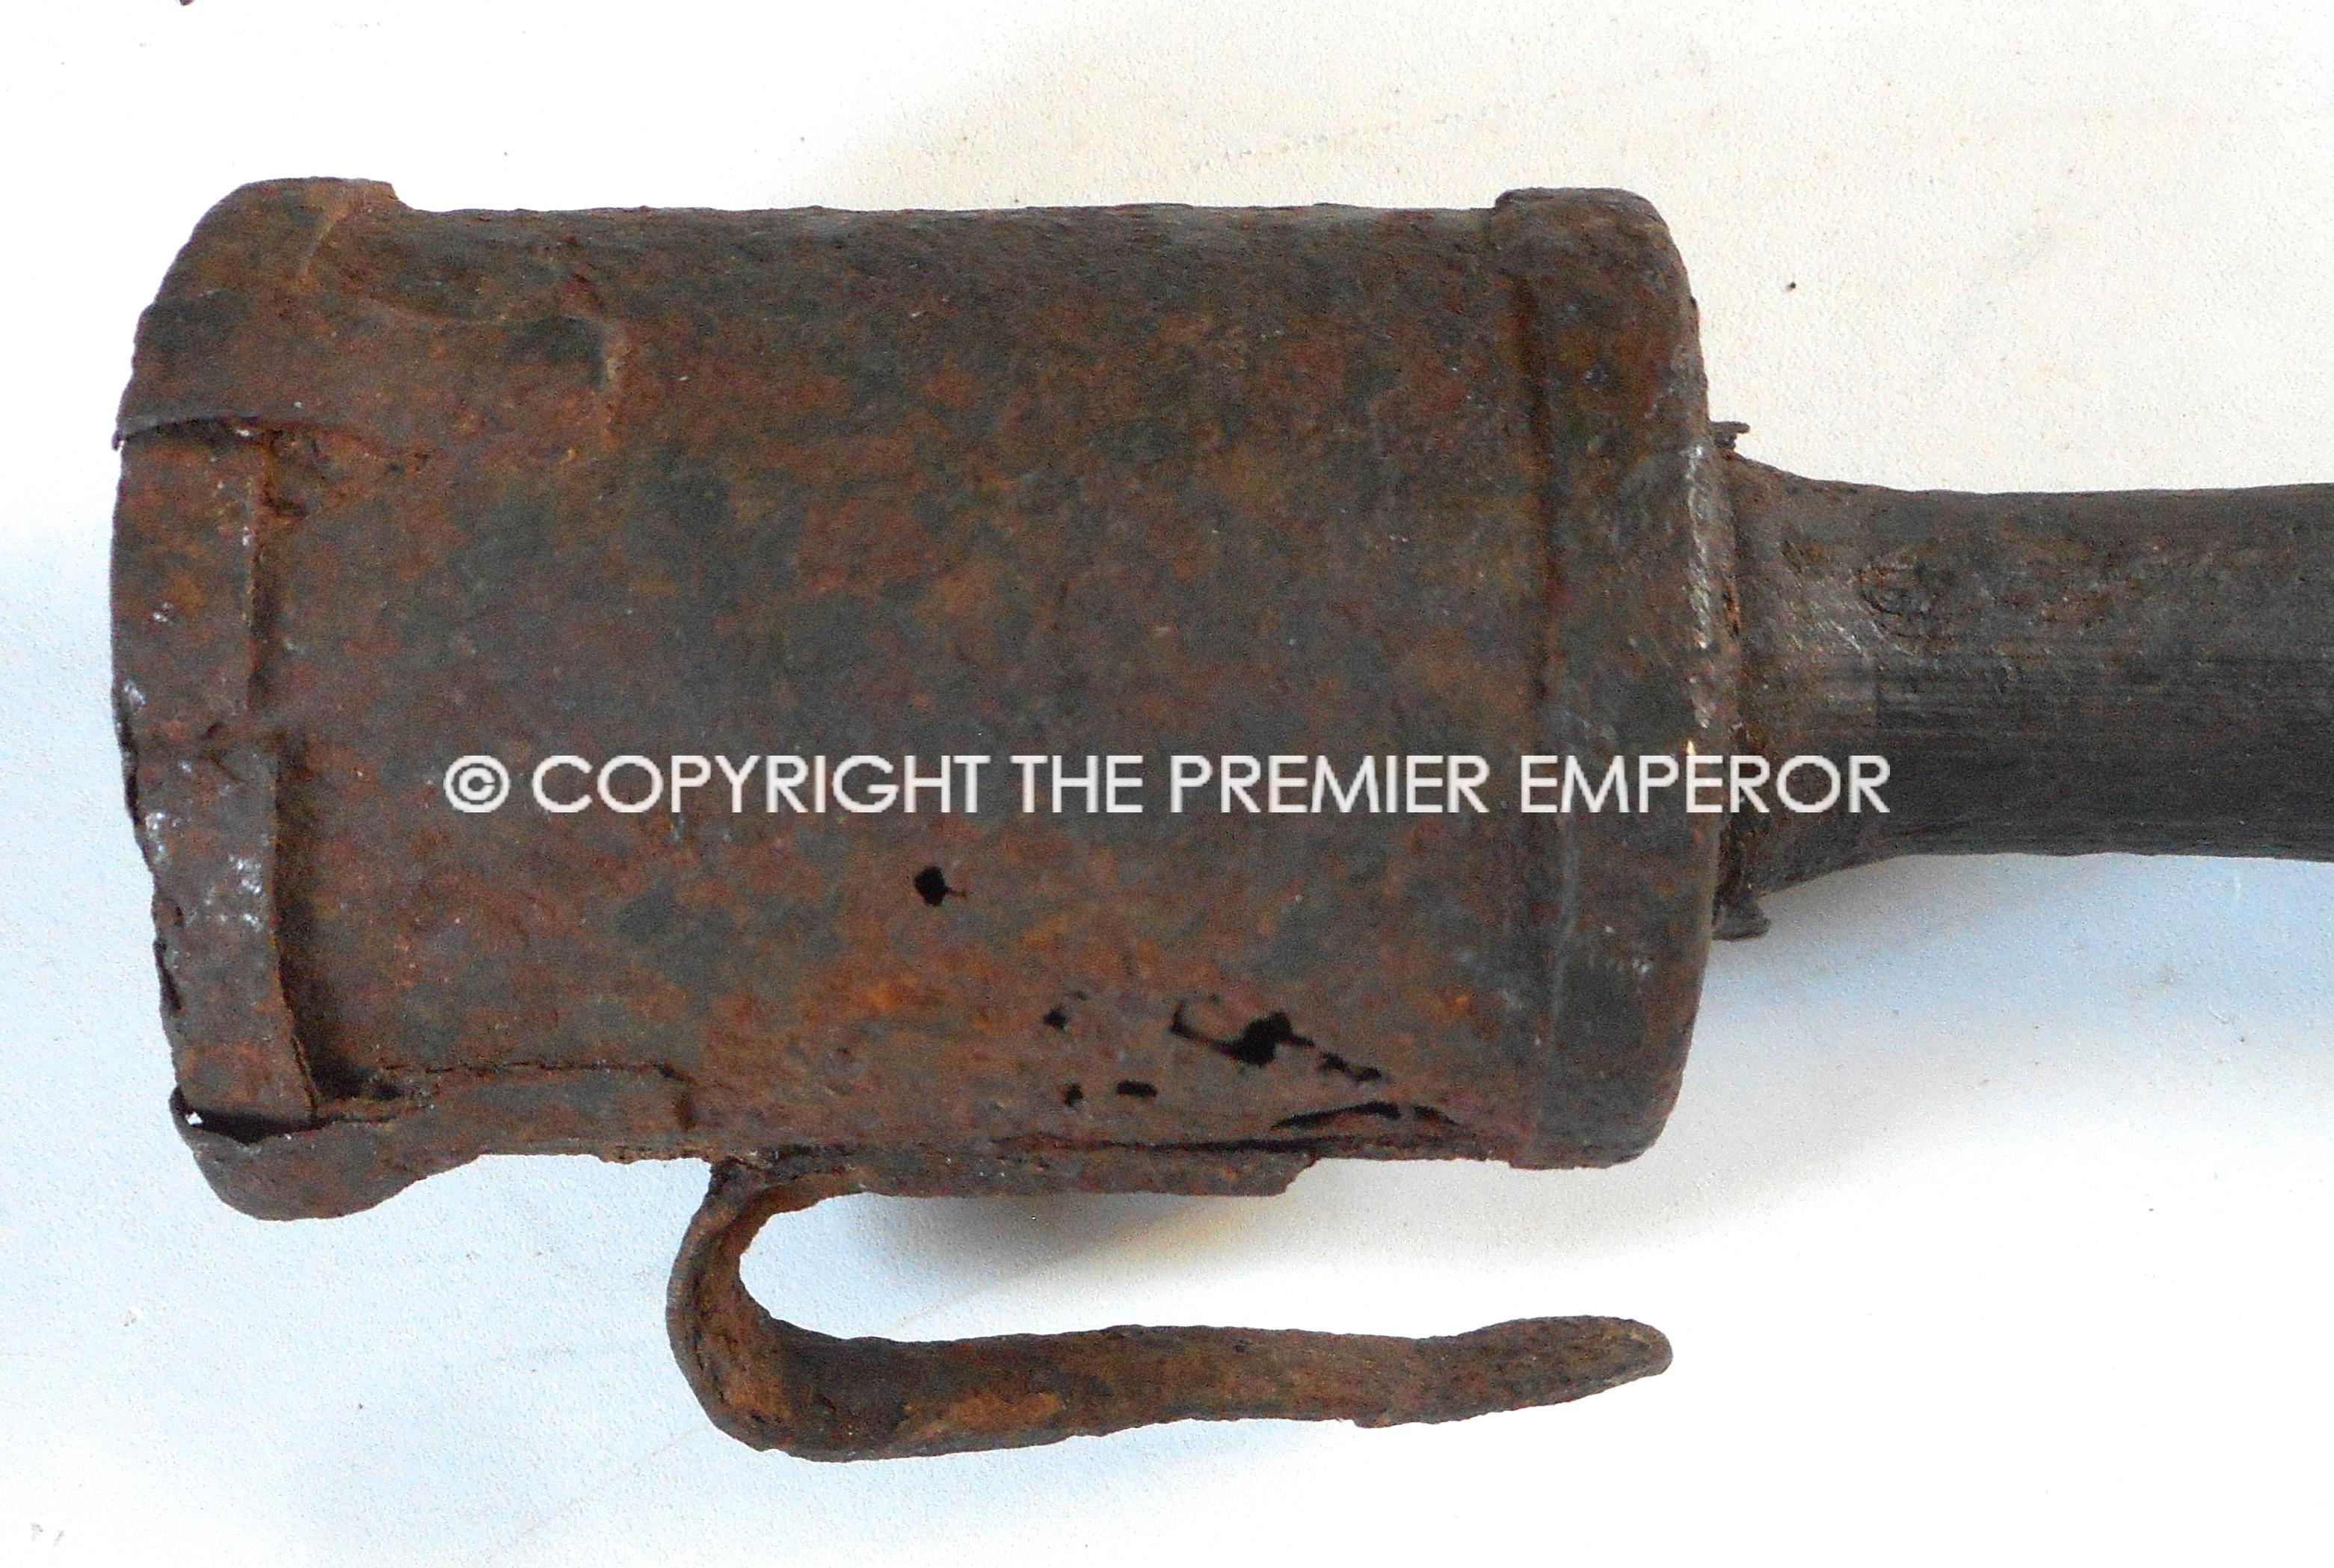 German Great War 1914/1918 Battlefield Relic Stick Grenade Circa 1915/18  (Totally Inert)